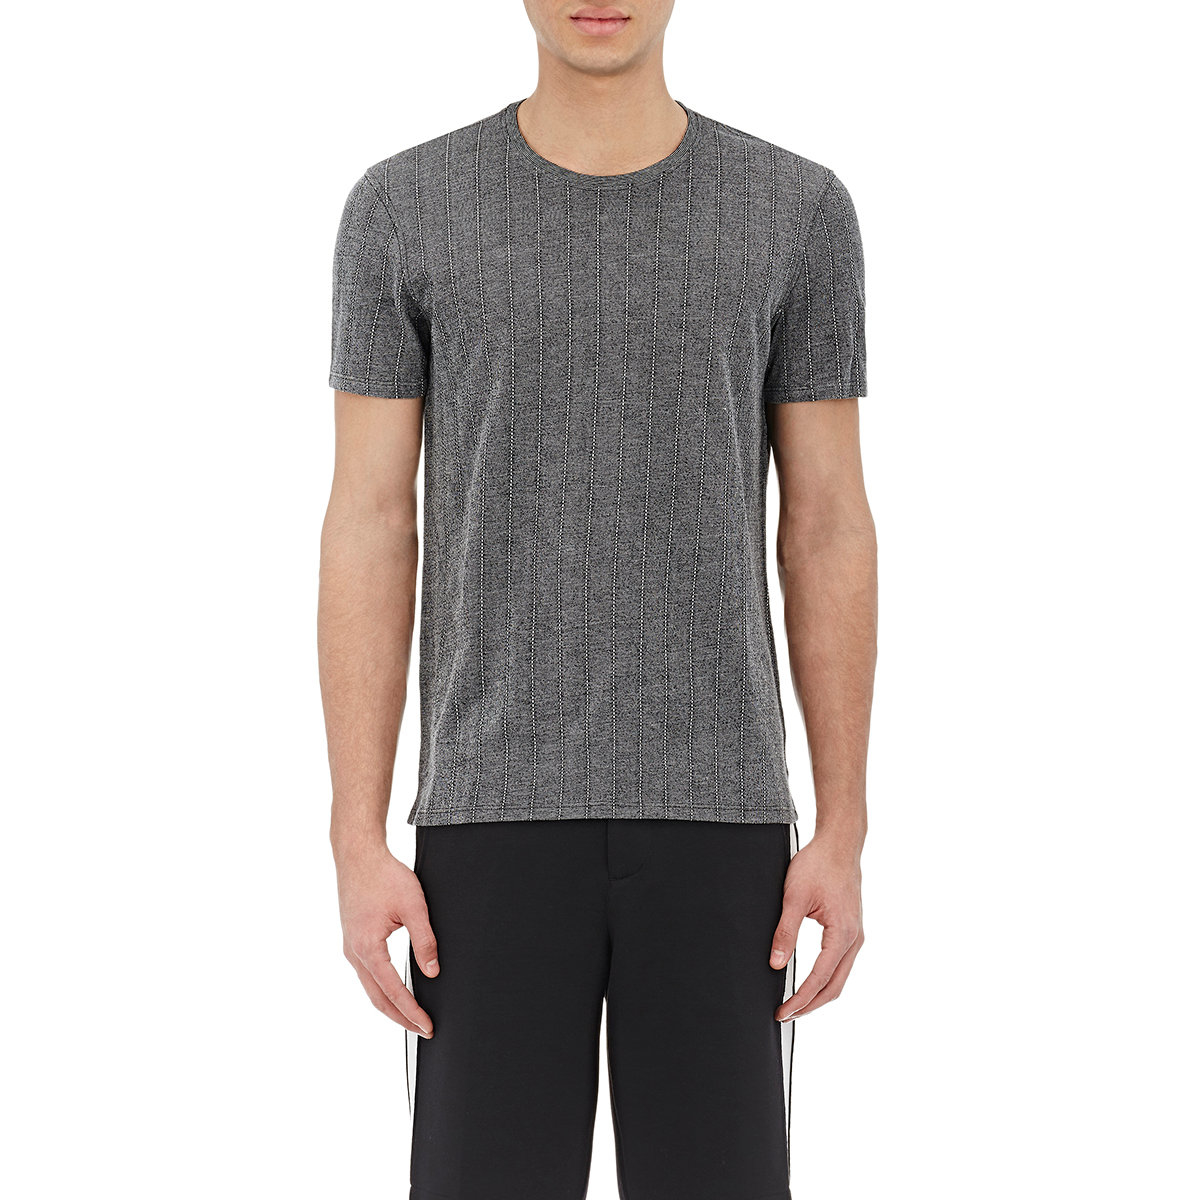 Lyst atm striped t shirt in black for men for Atm t shirt sale